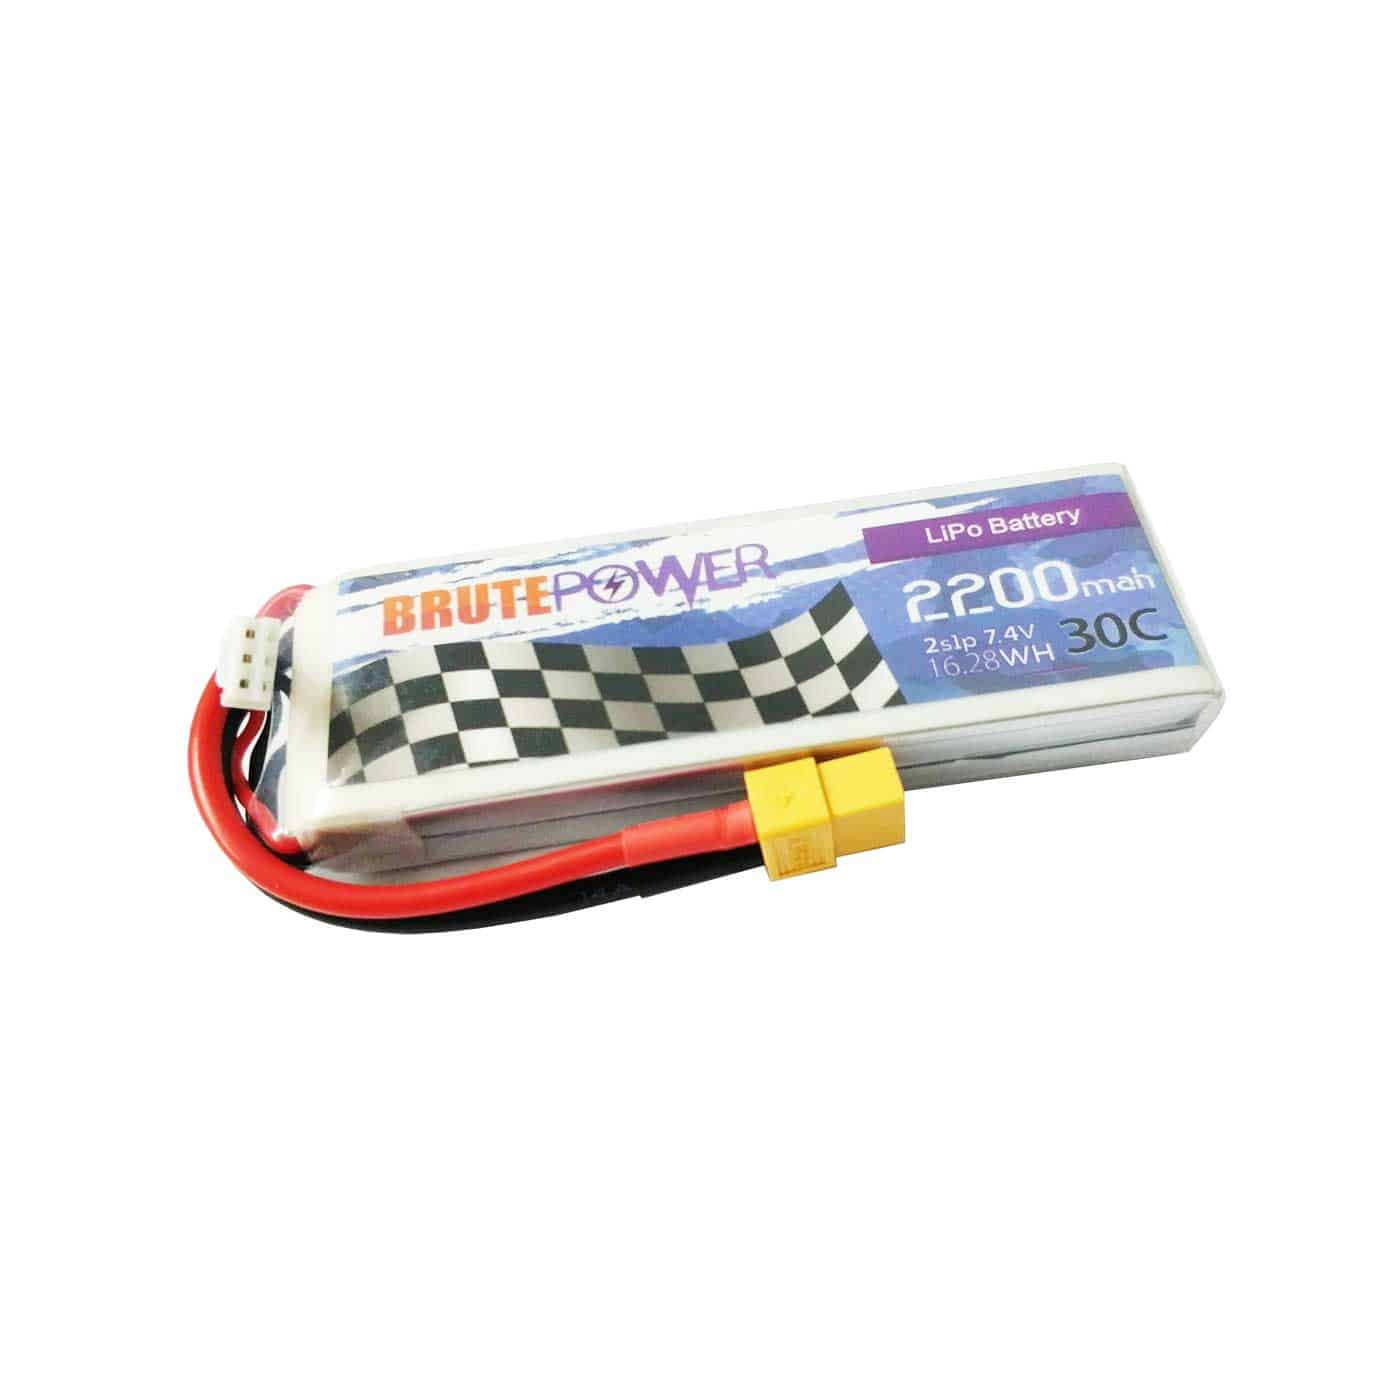 Batería Lipo Brutepower 2s 2200mah